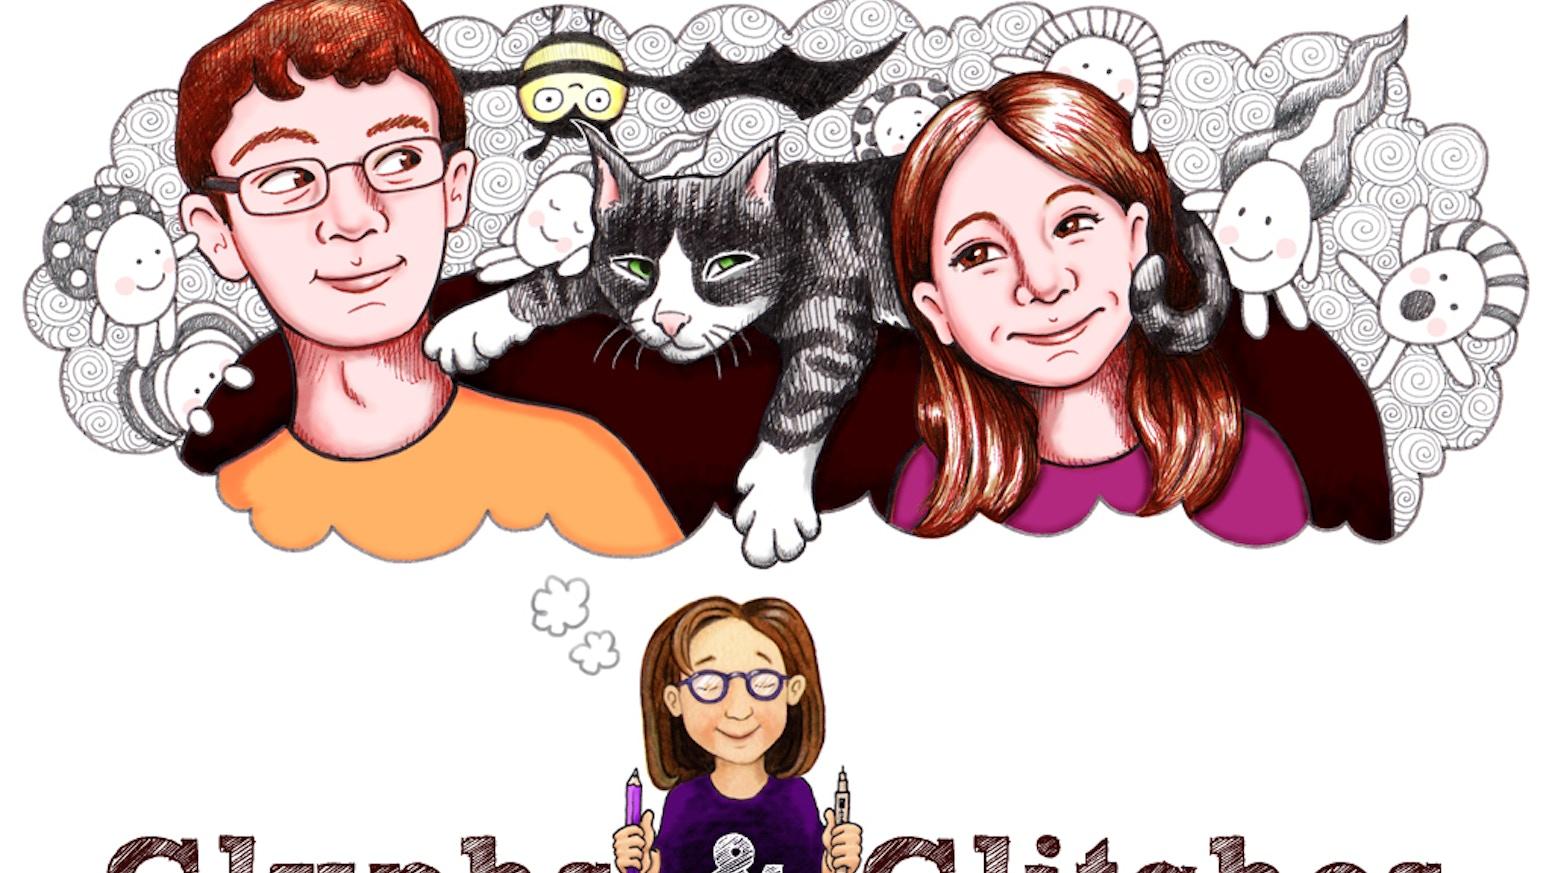 Rhode Island School Of Design Kickstarter Creative Cute Bearded Cartoon Girl Key Purse Ee8ffa886895648911ac890f5b72fb29 Originalixlibrb 11